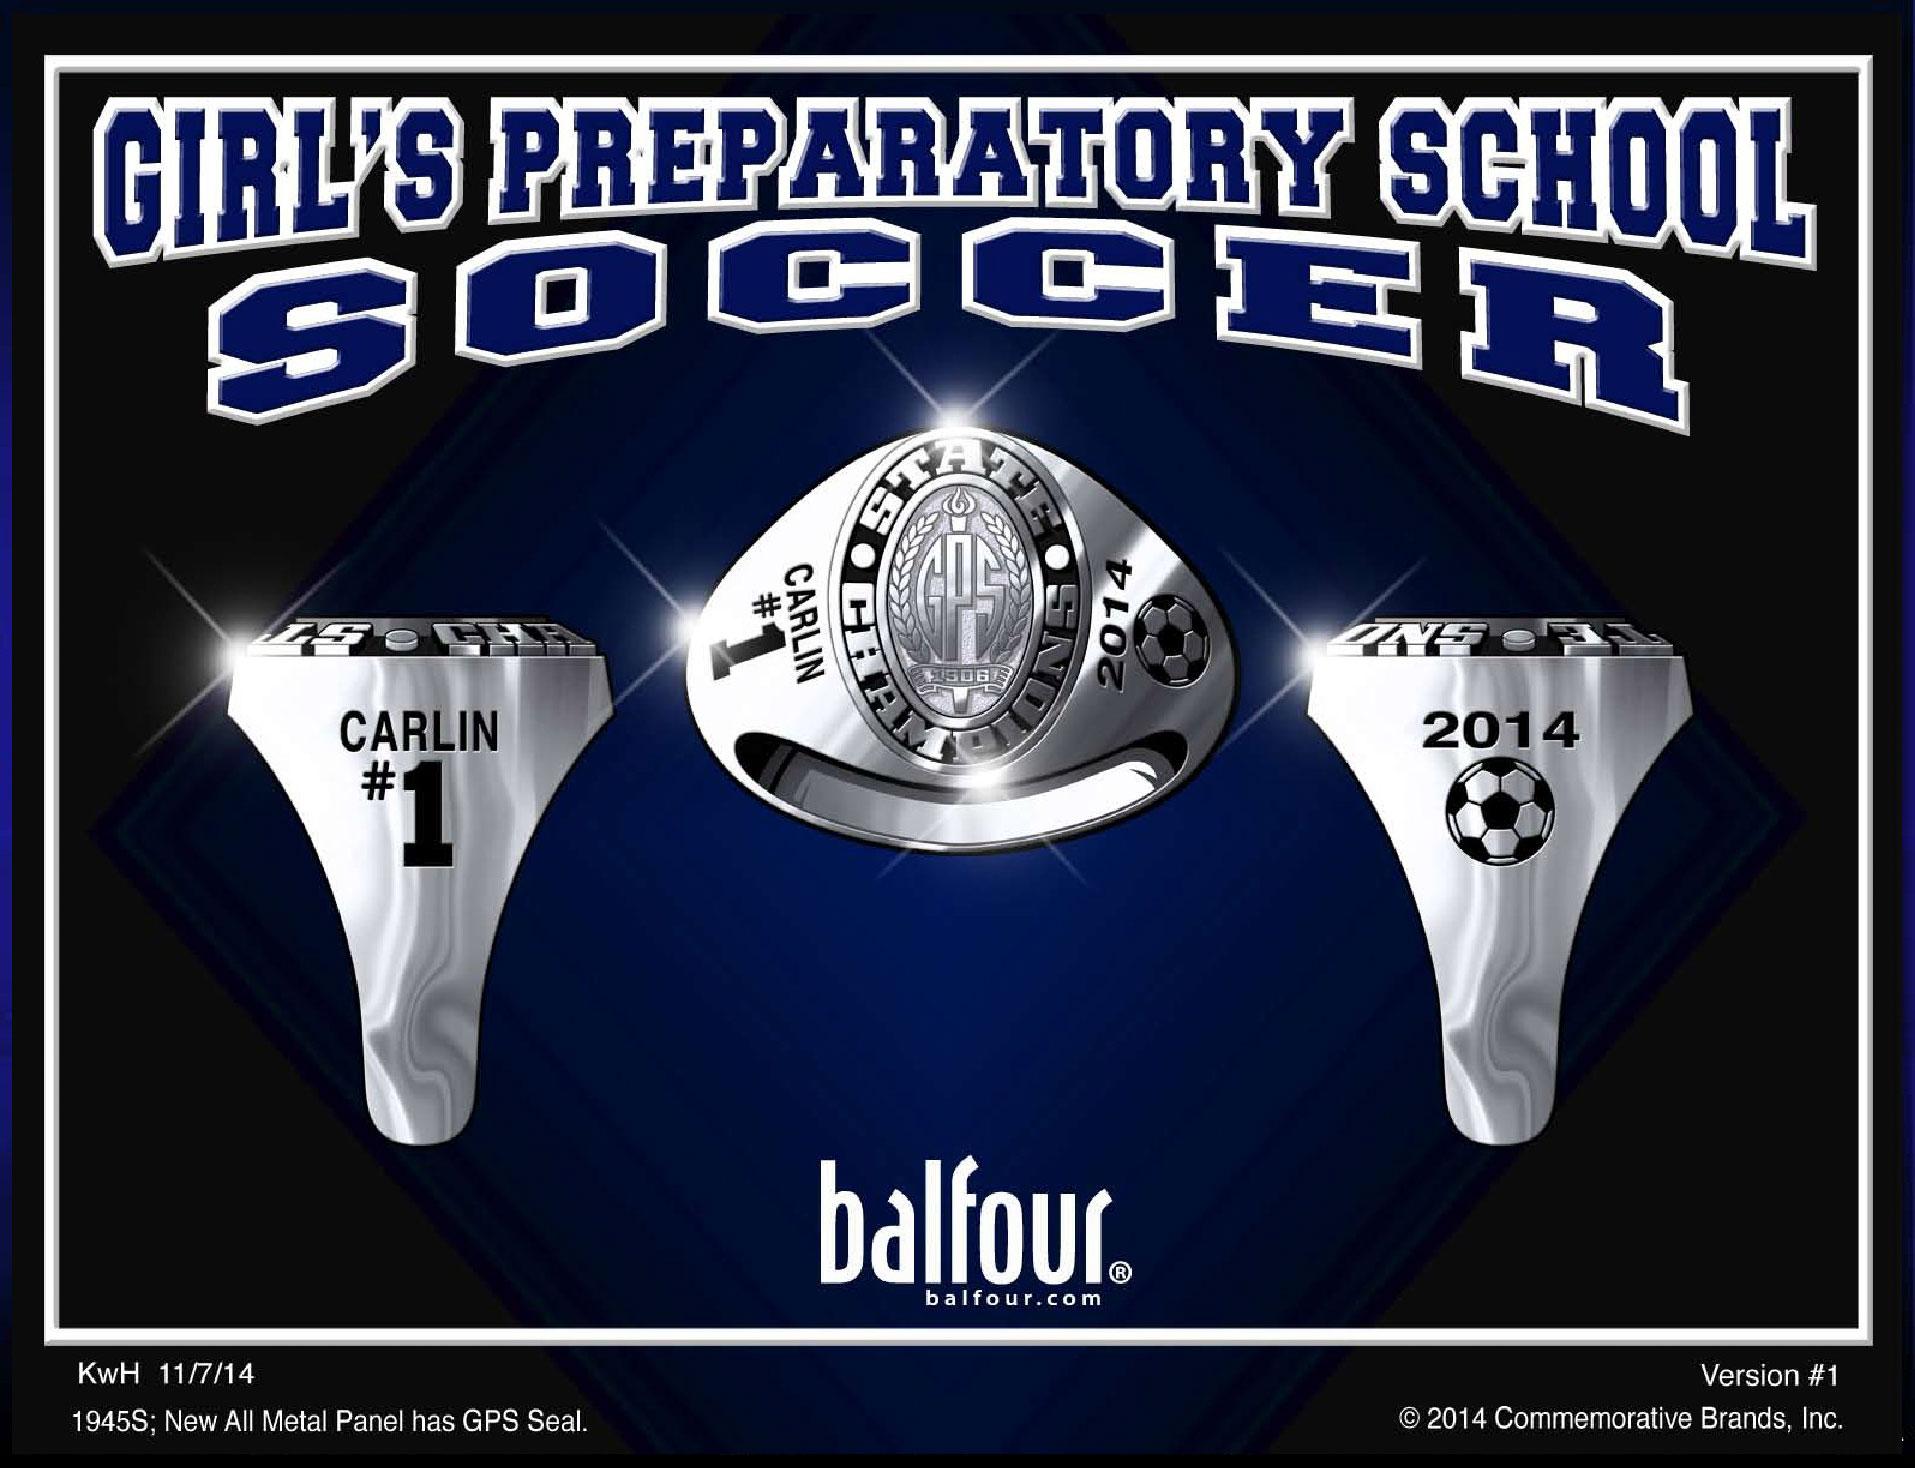 GPS Soccer high school championship rings